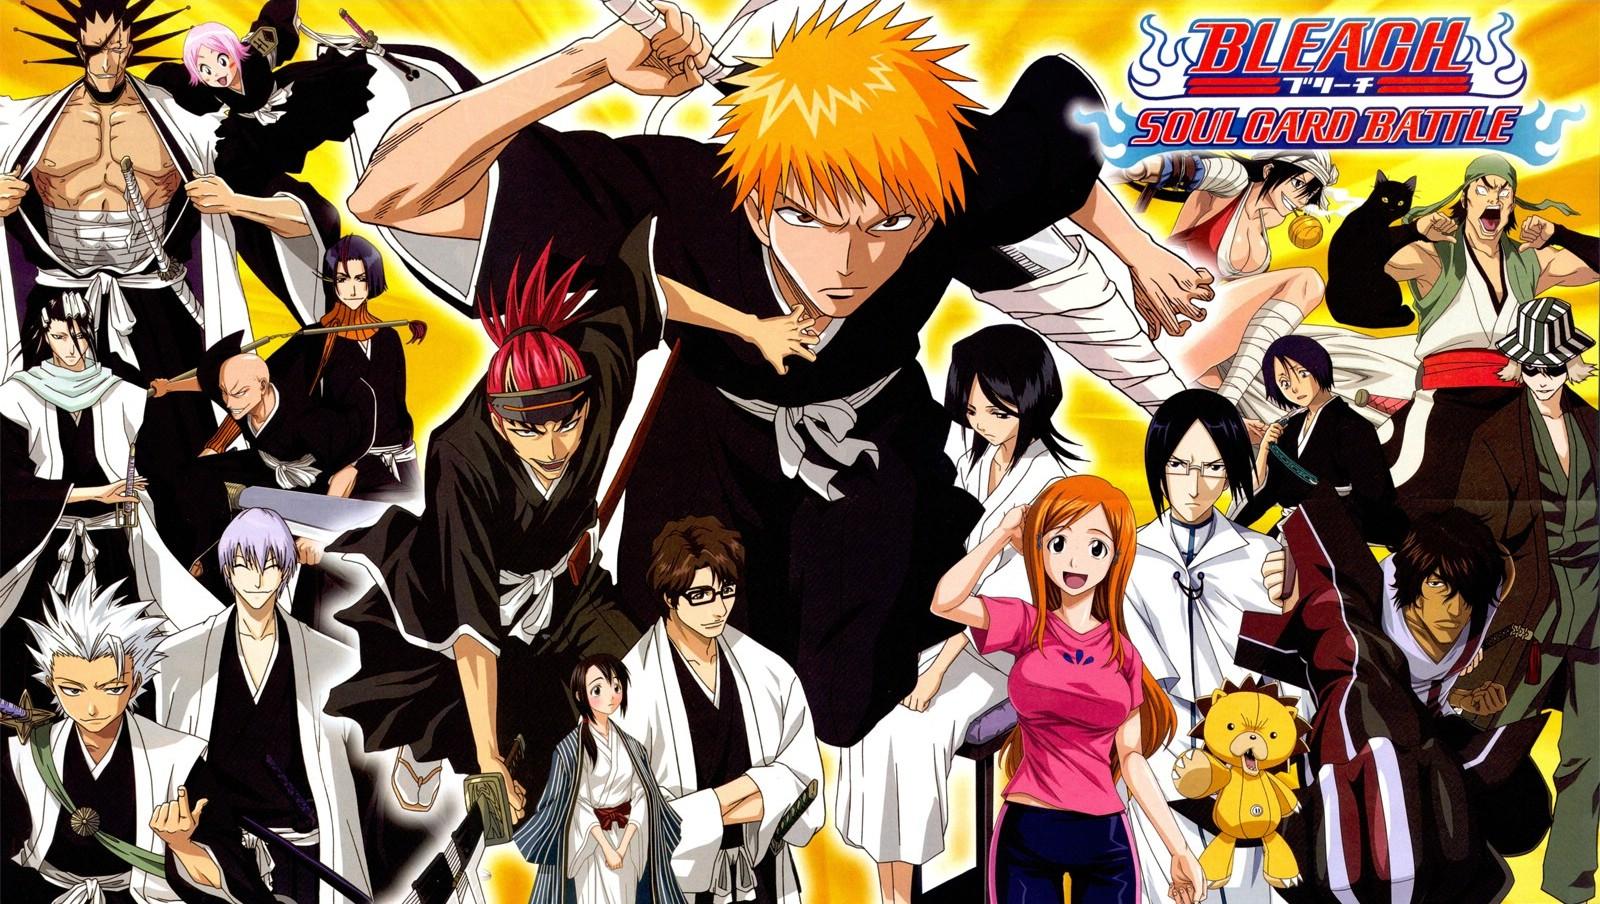 http://2.bp.blogspot.com/--fxEjFASexQ/T7WLCdma-WI/AAAAAAAADuU/2myaJrW-Lzg/s1600/Bleach+HD+Anime+Wallpapers+-+Naruto+and+Anime+Wallpapers+HD.jpg